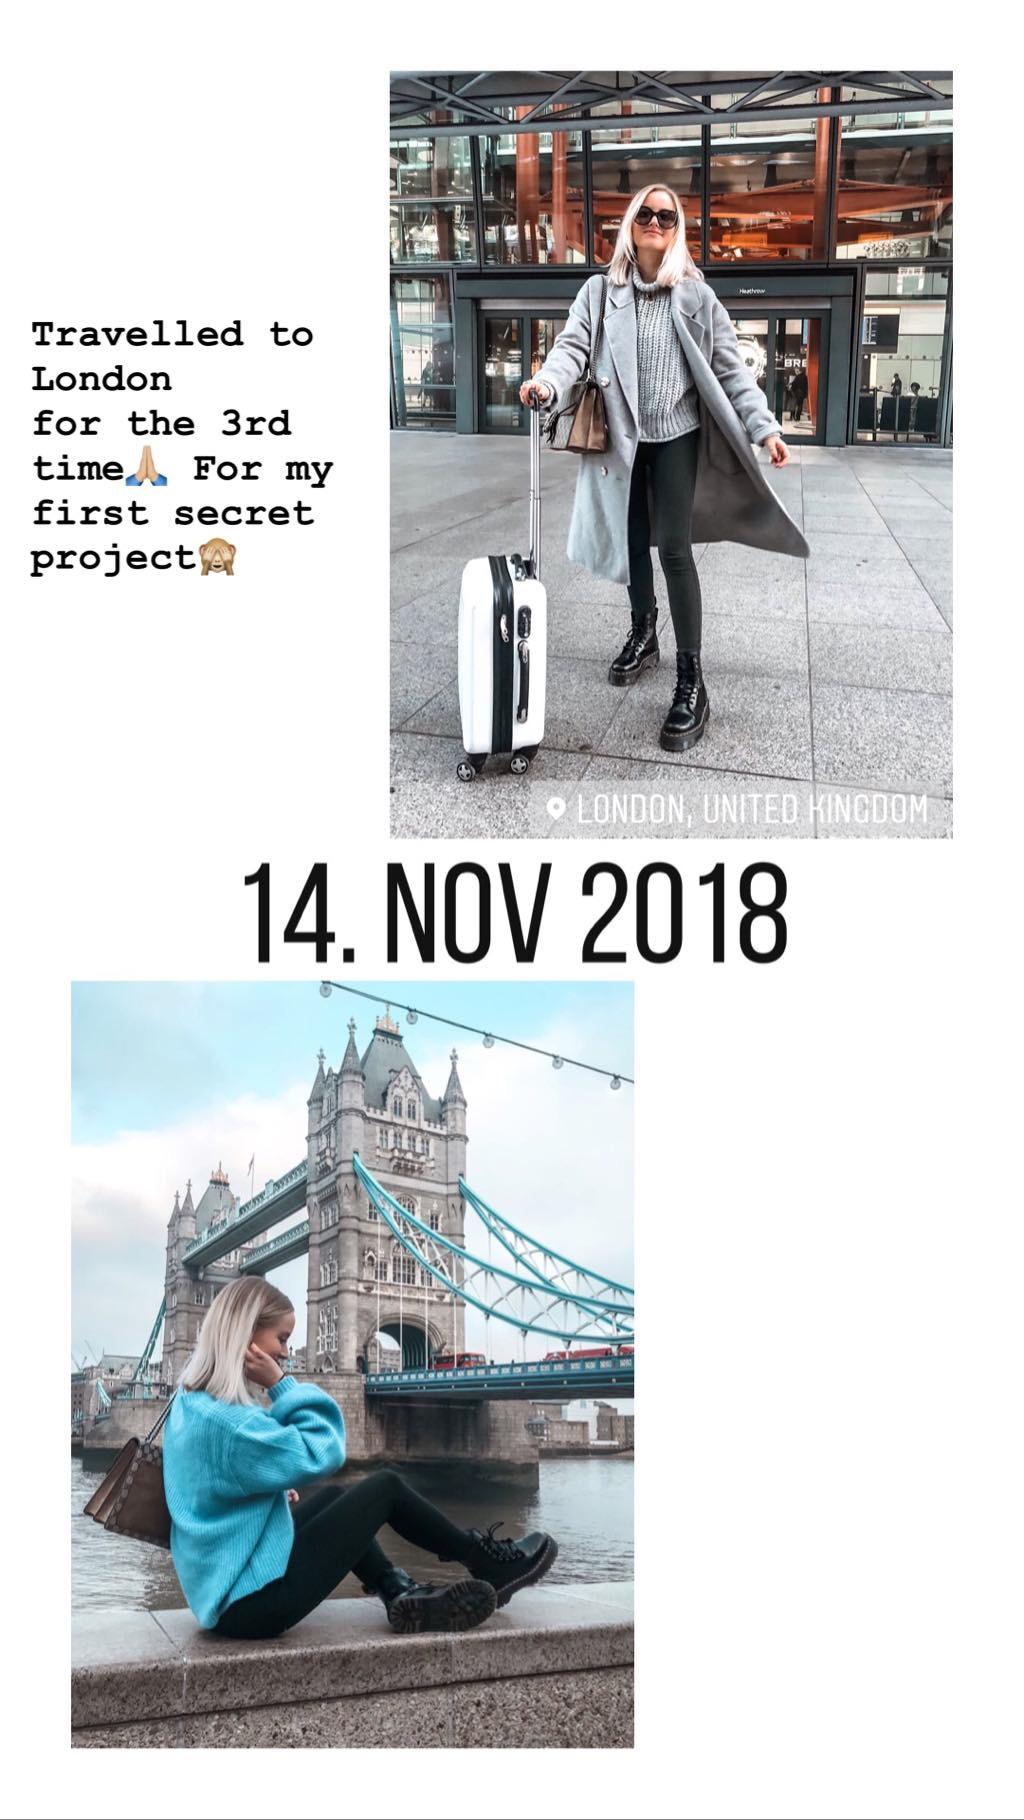 Mein Jahresrückblick 2018 - KIM ENGEL